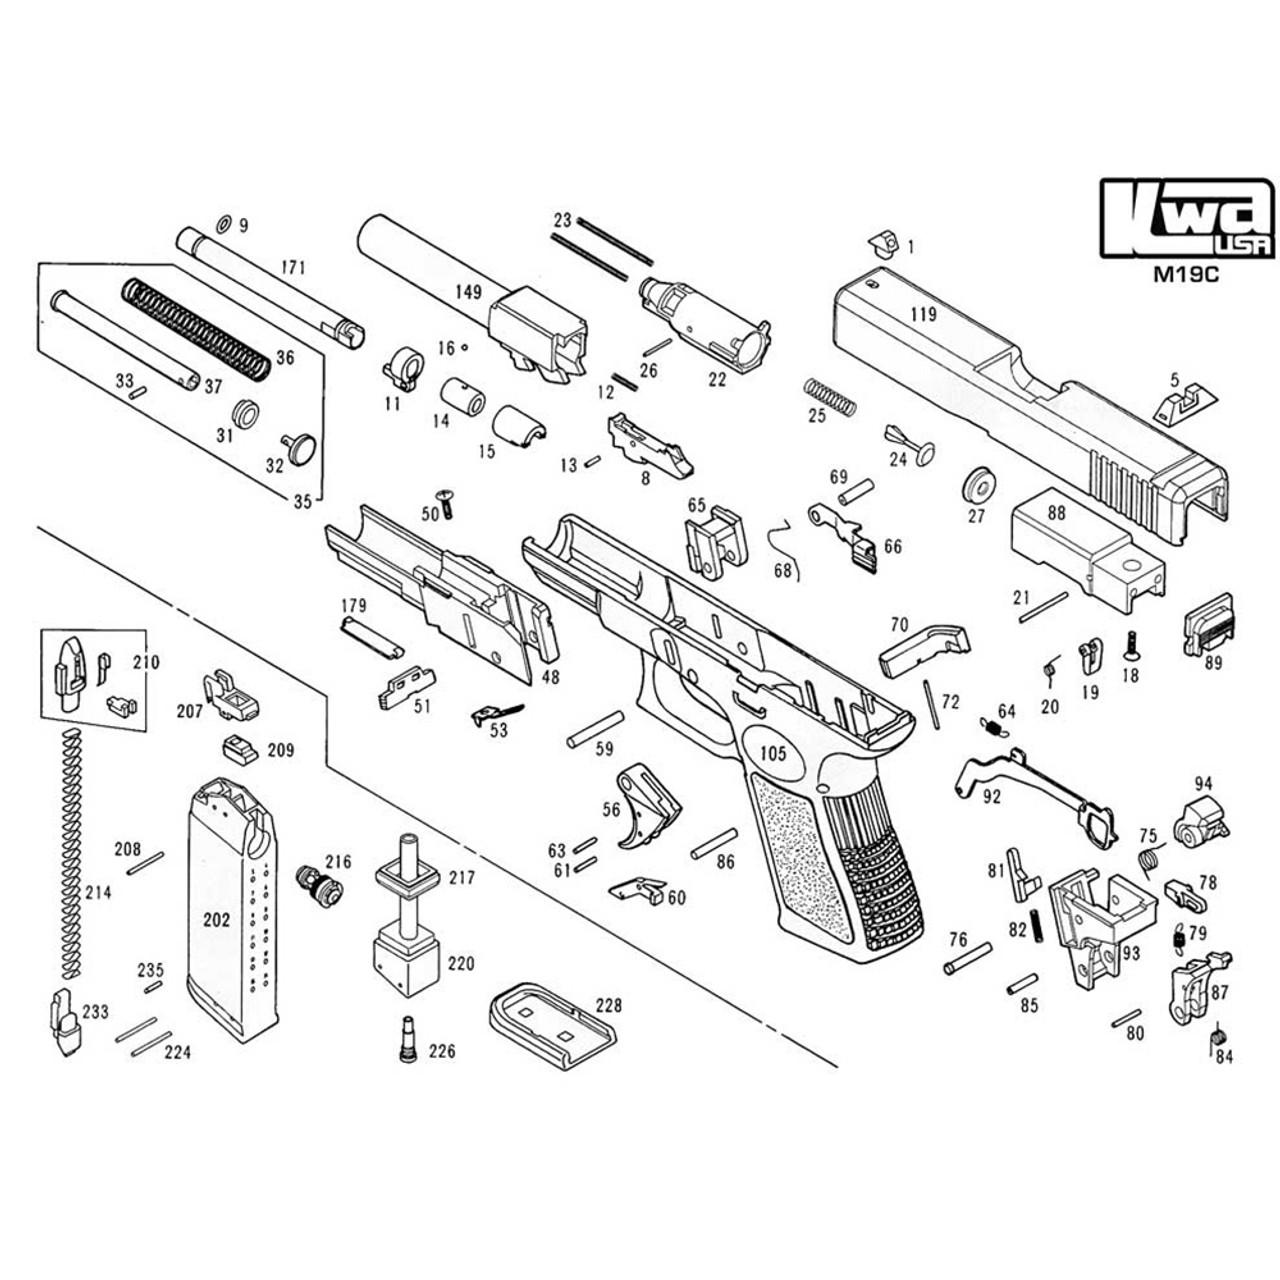 kwa airsoft m19c pistol diagram [ 1000 x 1000 Pixel ]